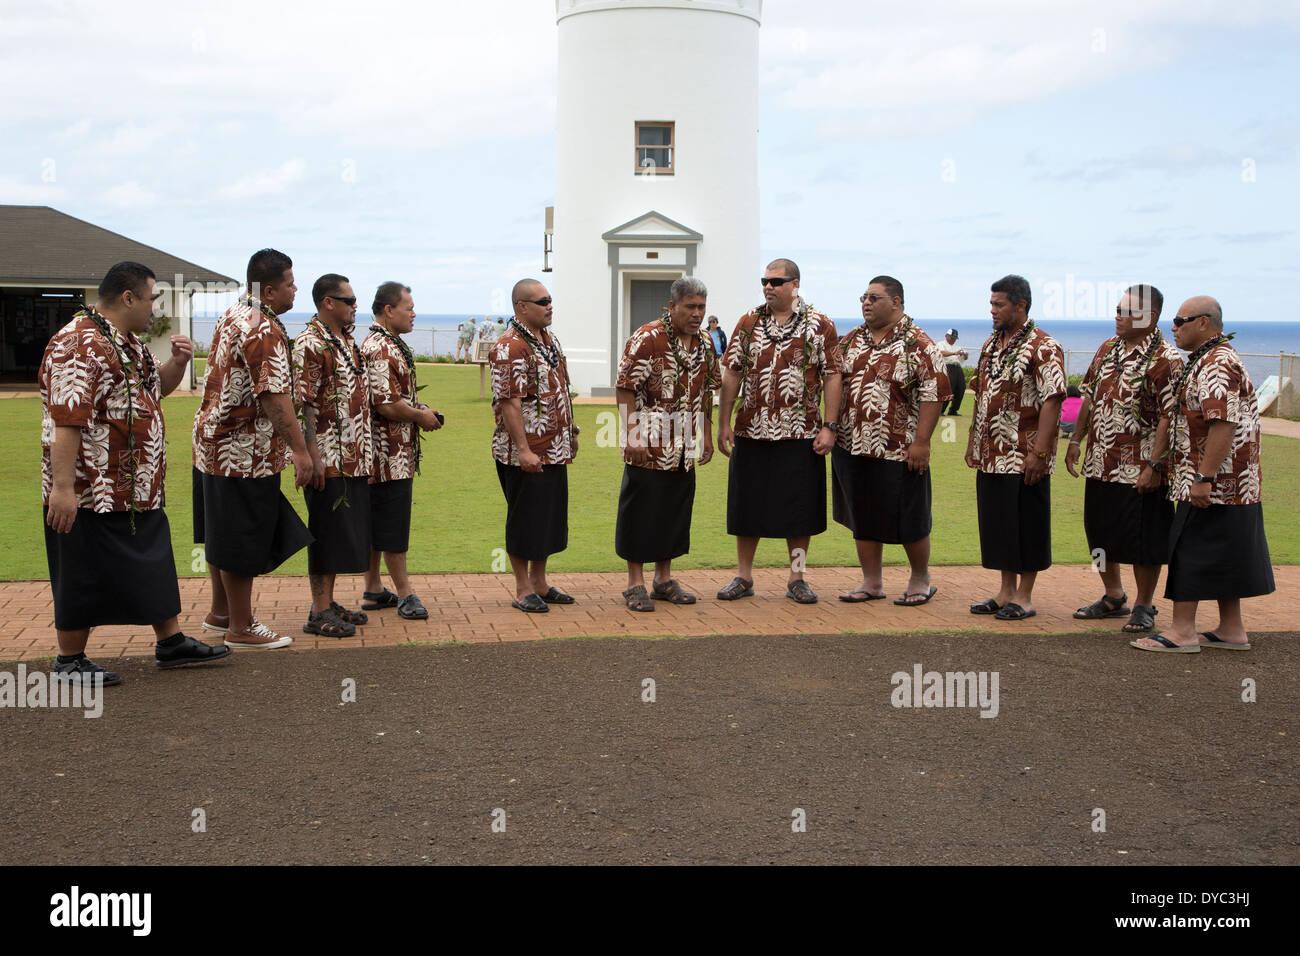 Samoan gospel singers performing at Kilauea Point Lighthouse - Stock Image